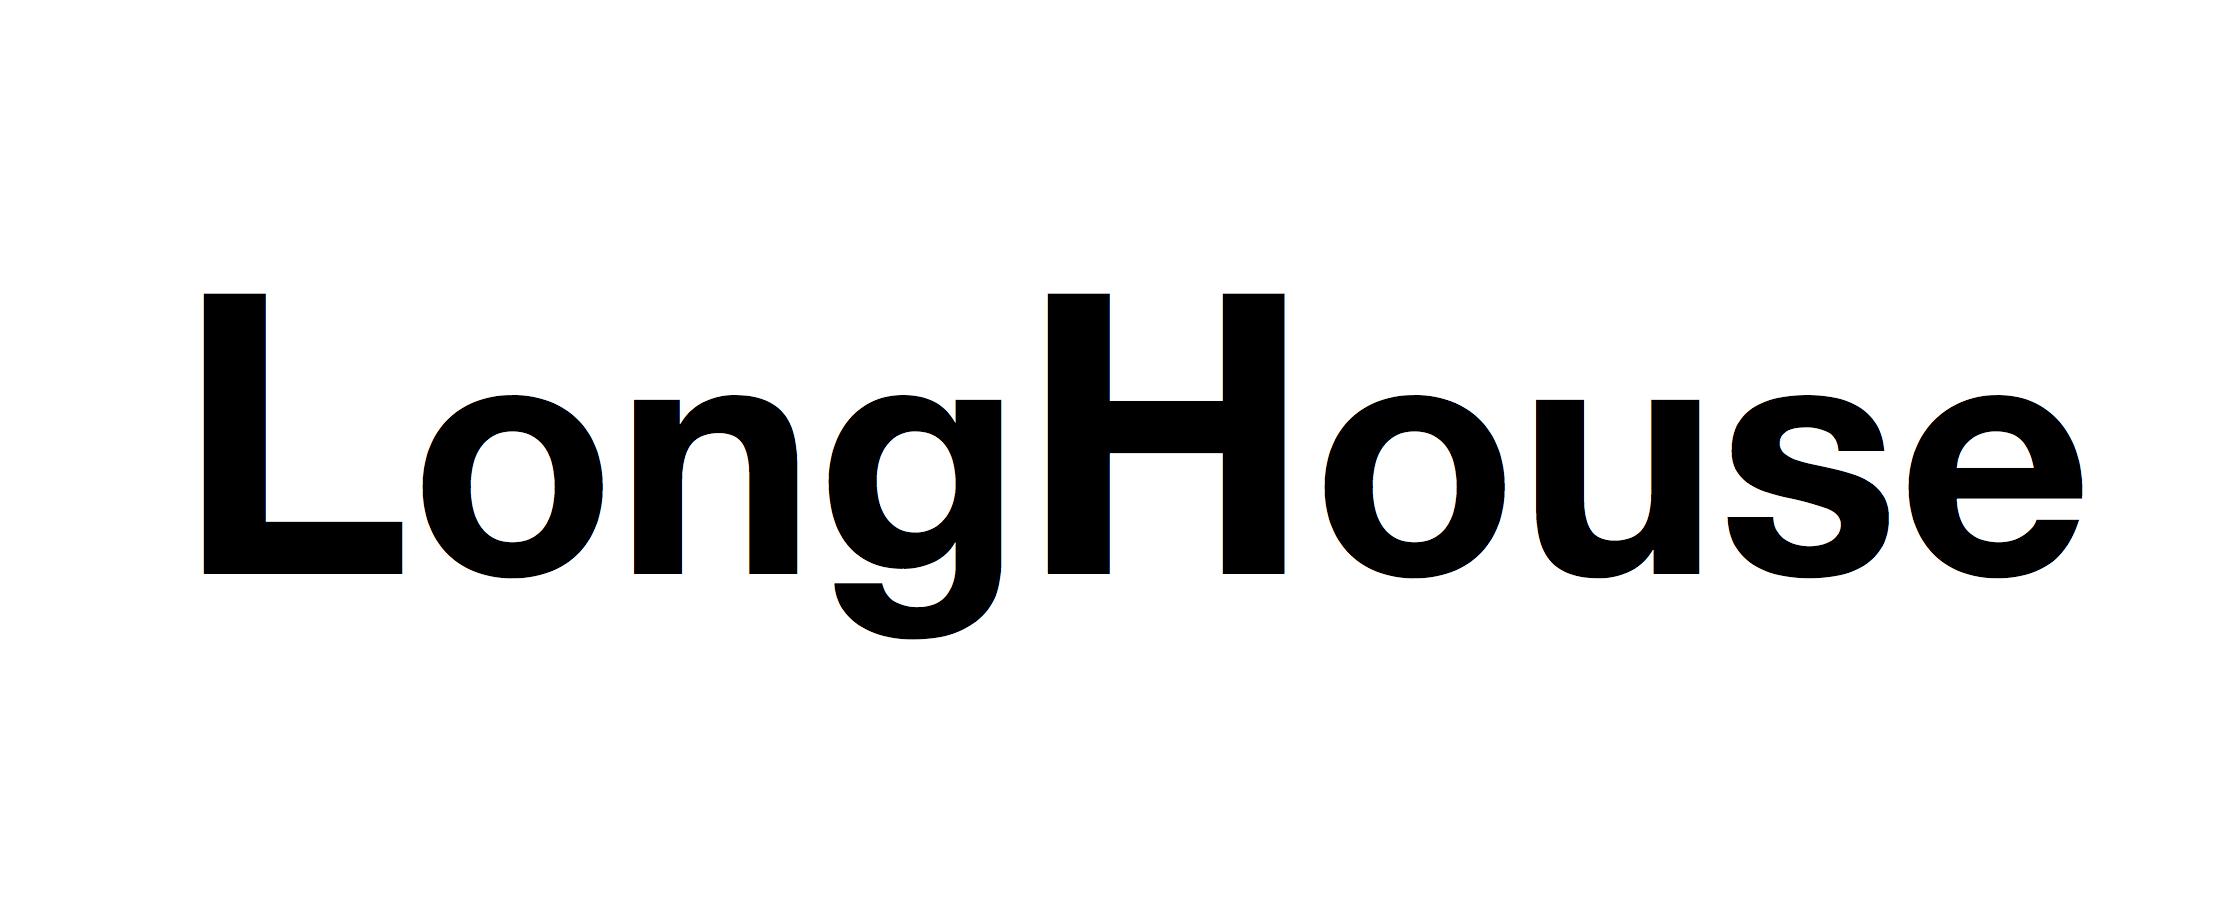 LongHouse_Logo_(1).png